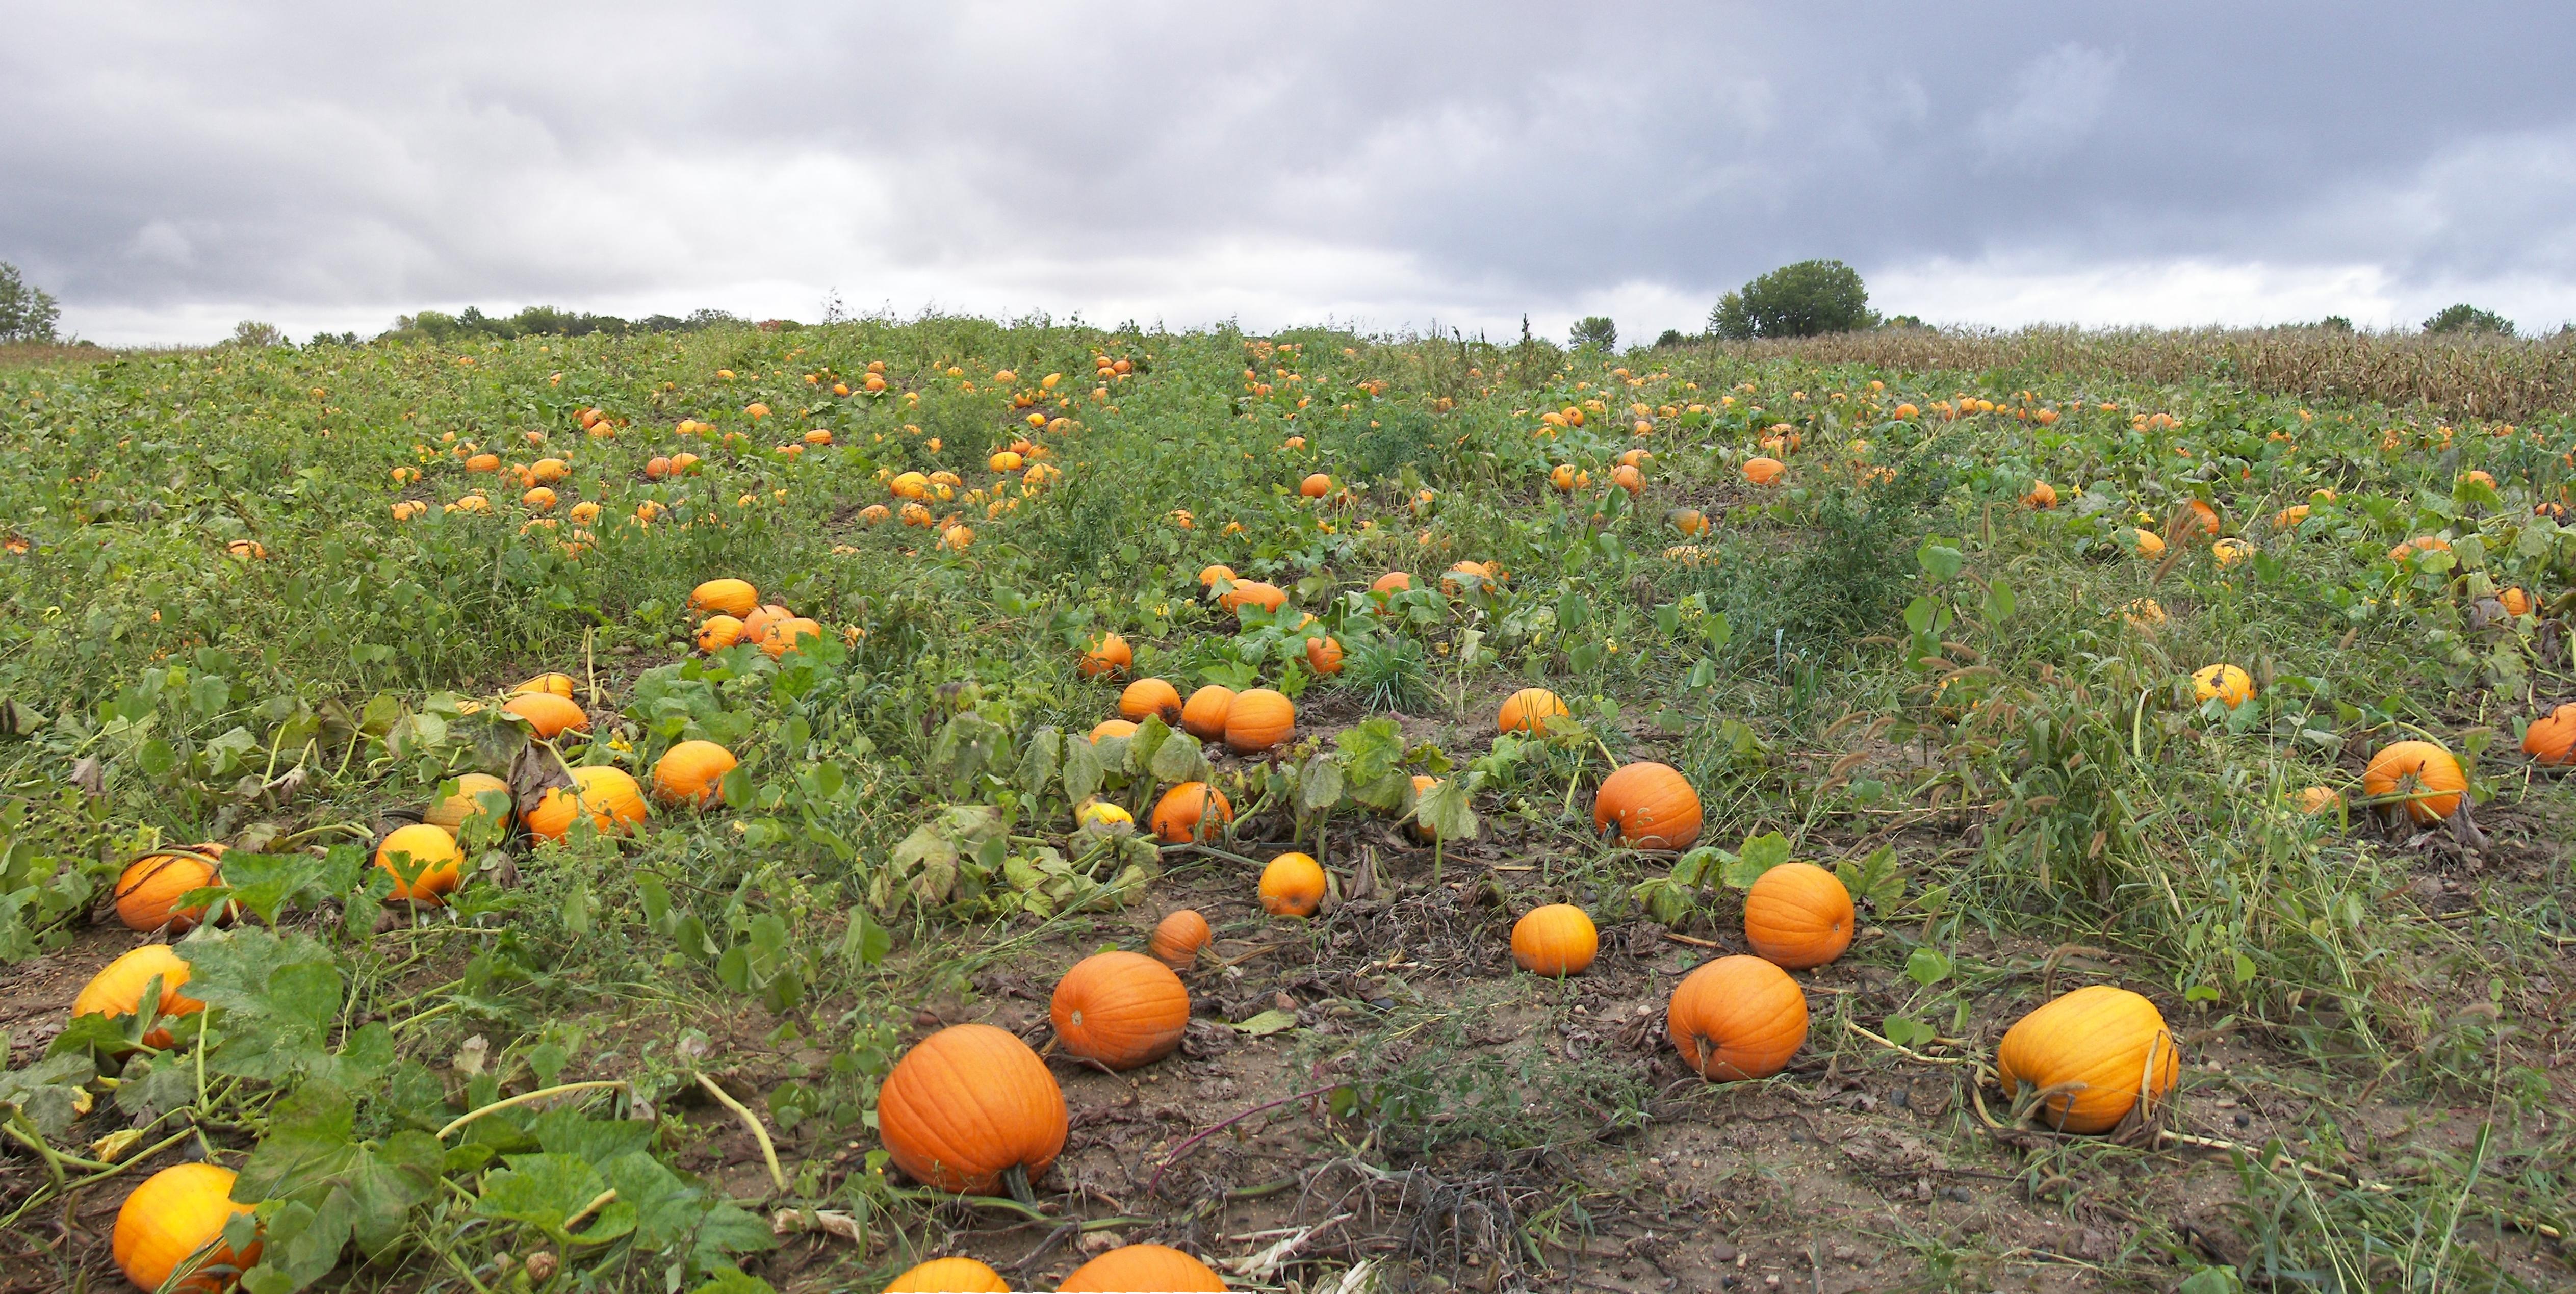 Pumpkin Patch By Archangelical-Stock On DeviantArt